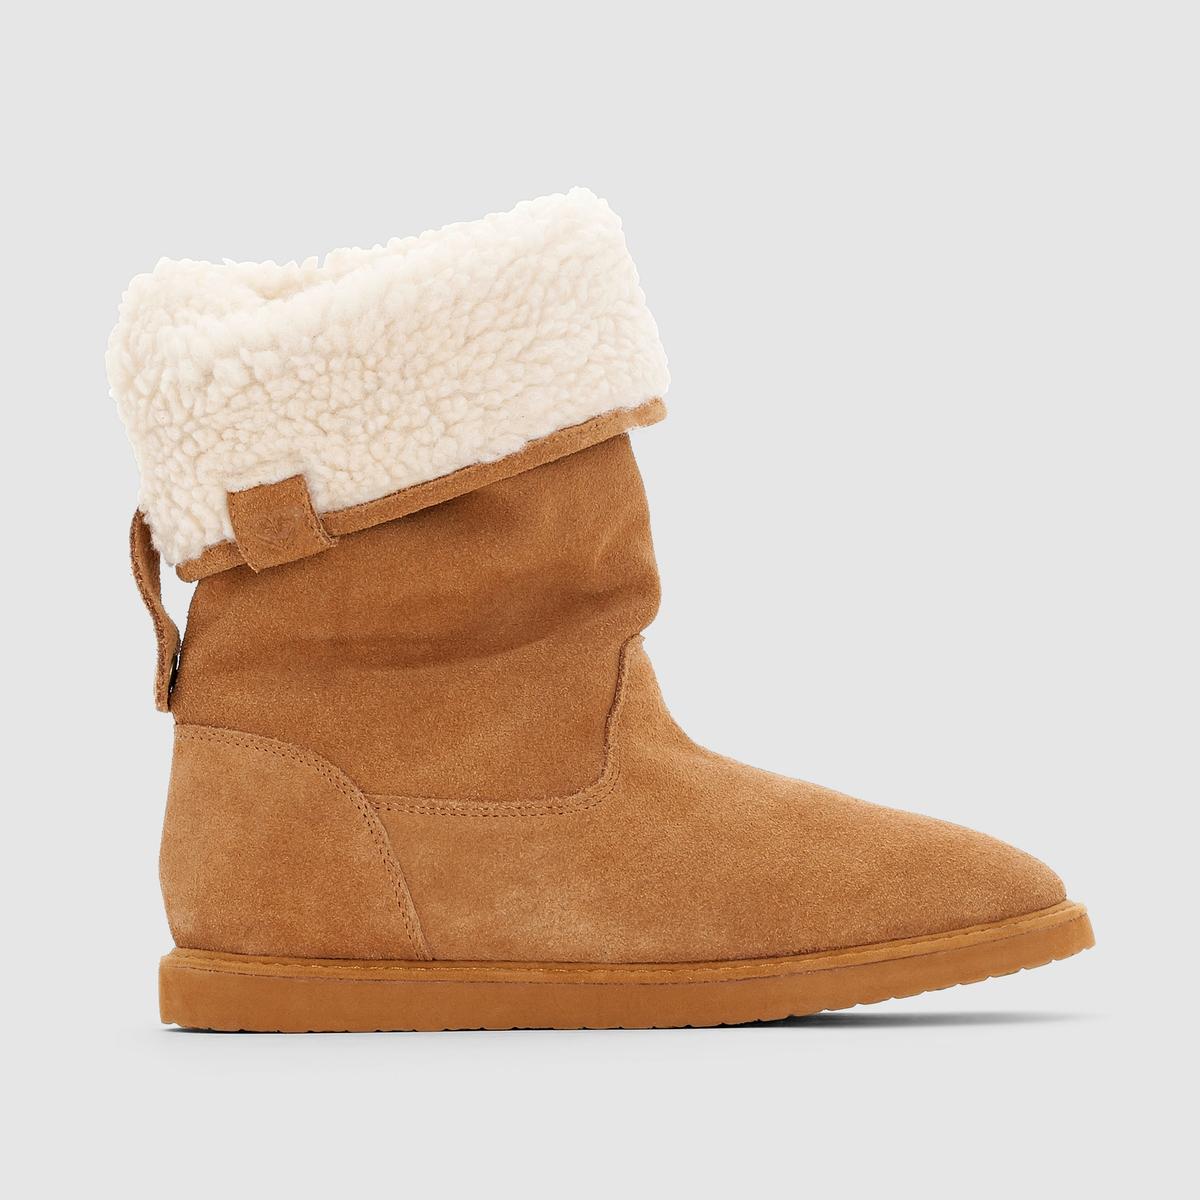 Ботинки Erin J Boot Brn ботинки roxy timber j boot brn